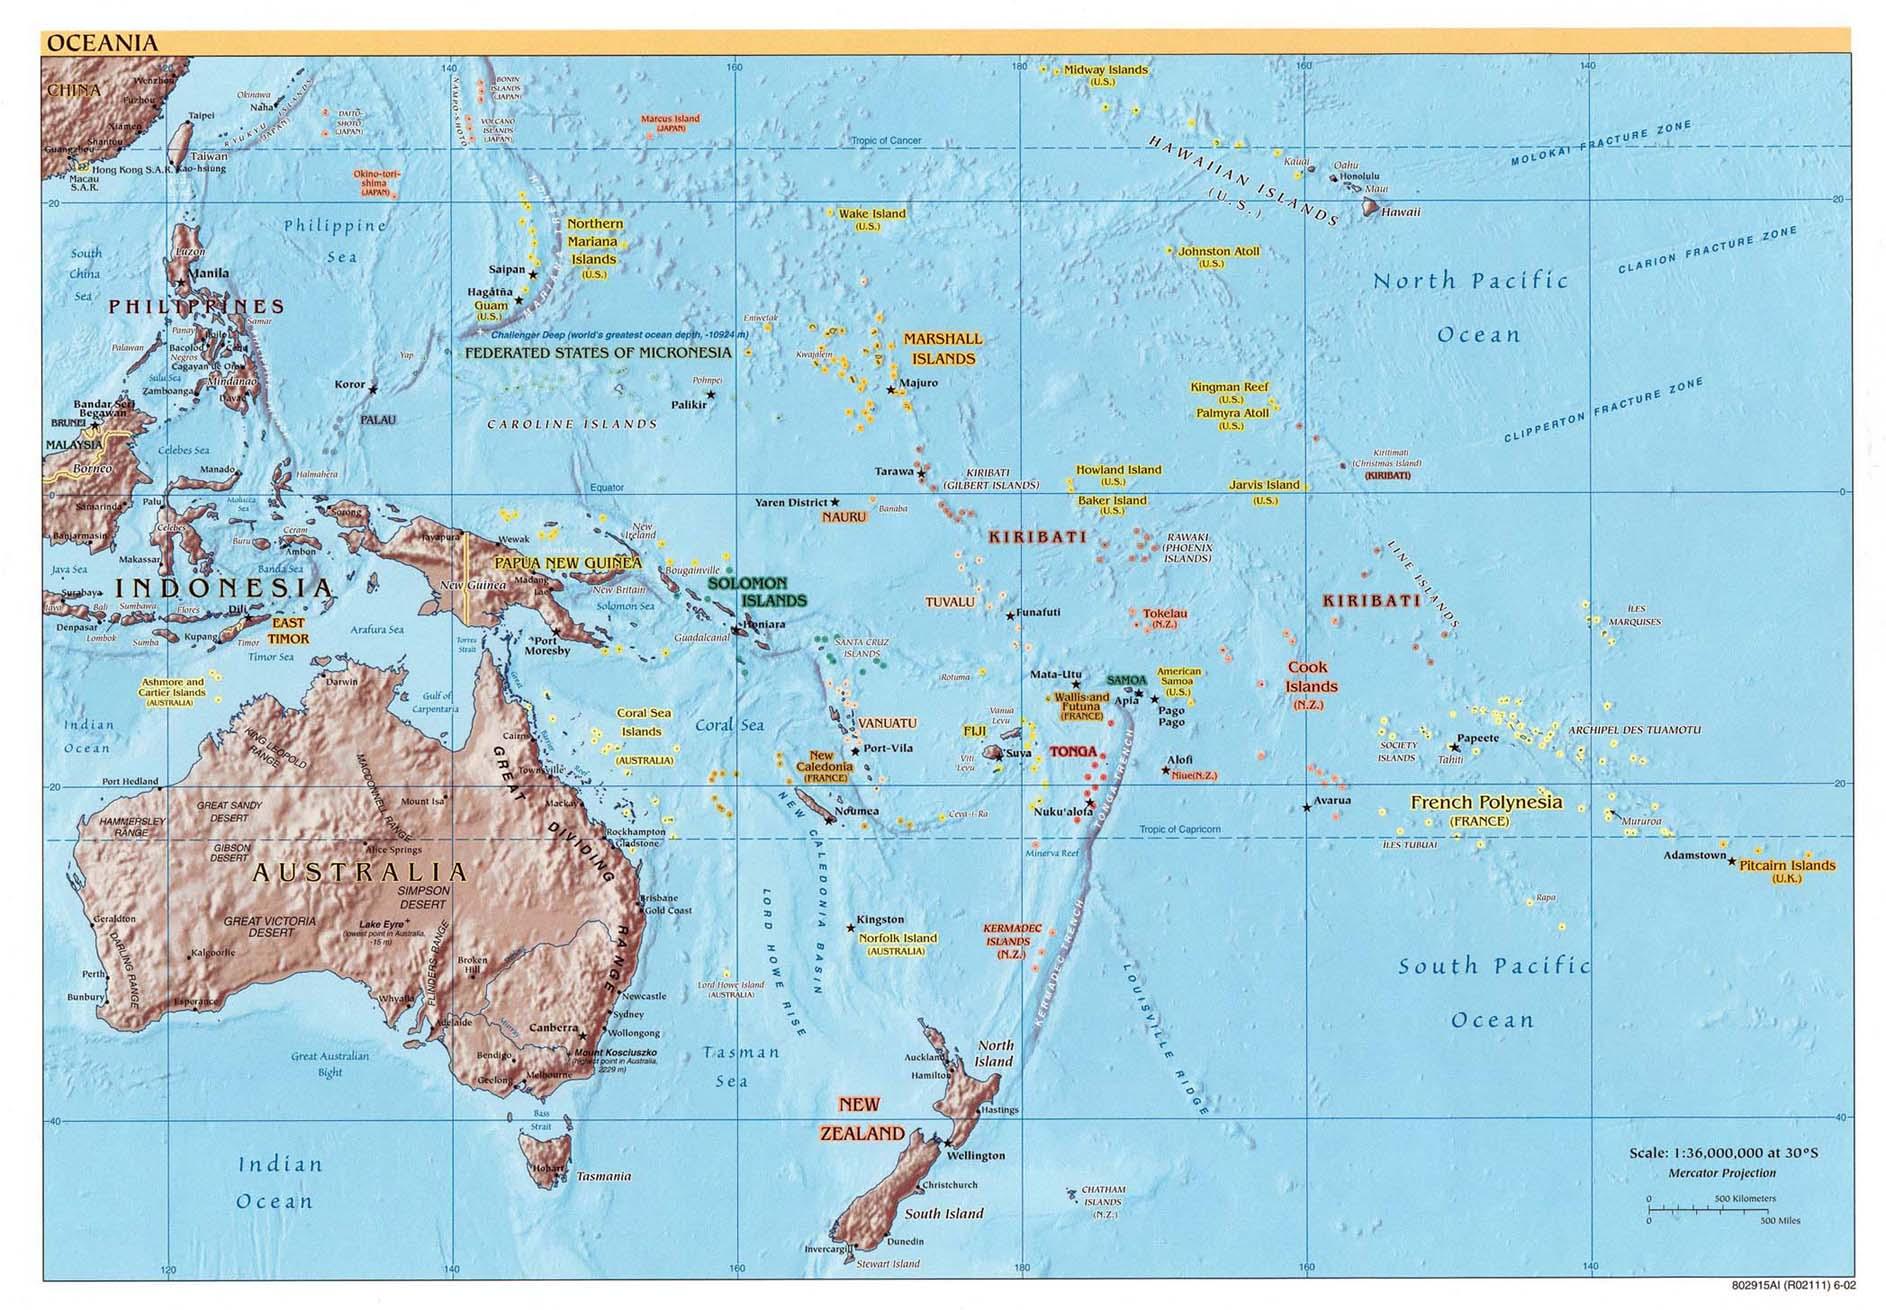 Free Download Australia Oceania Maps